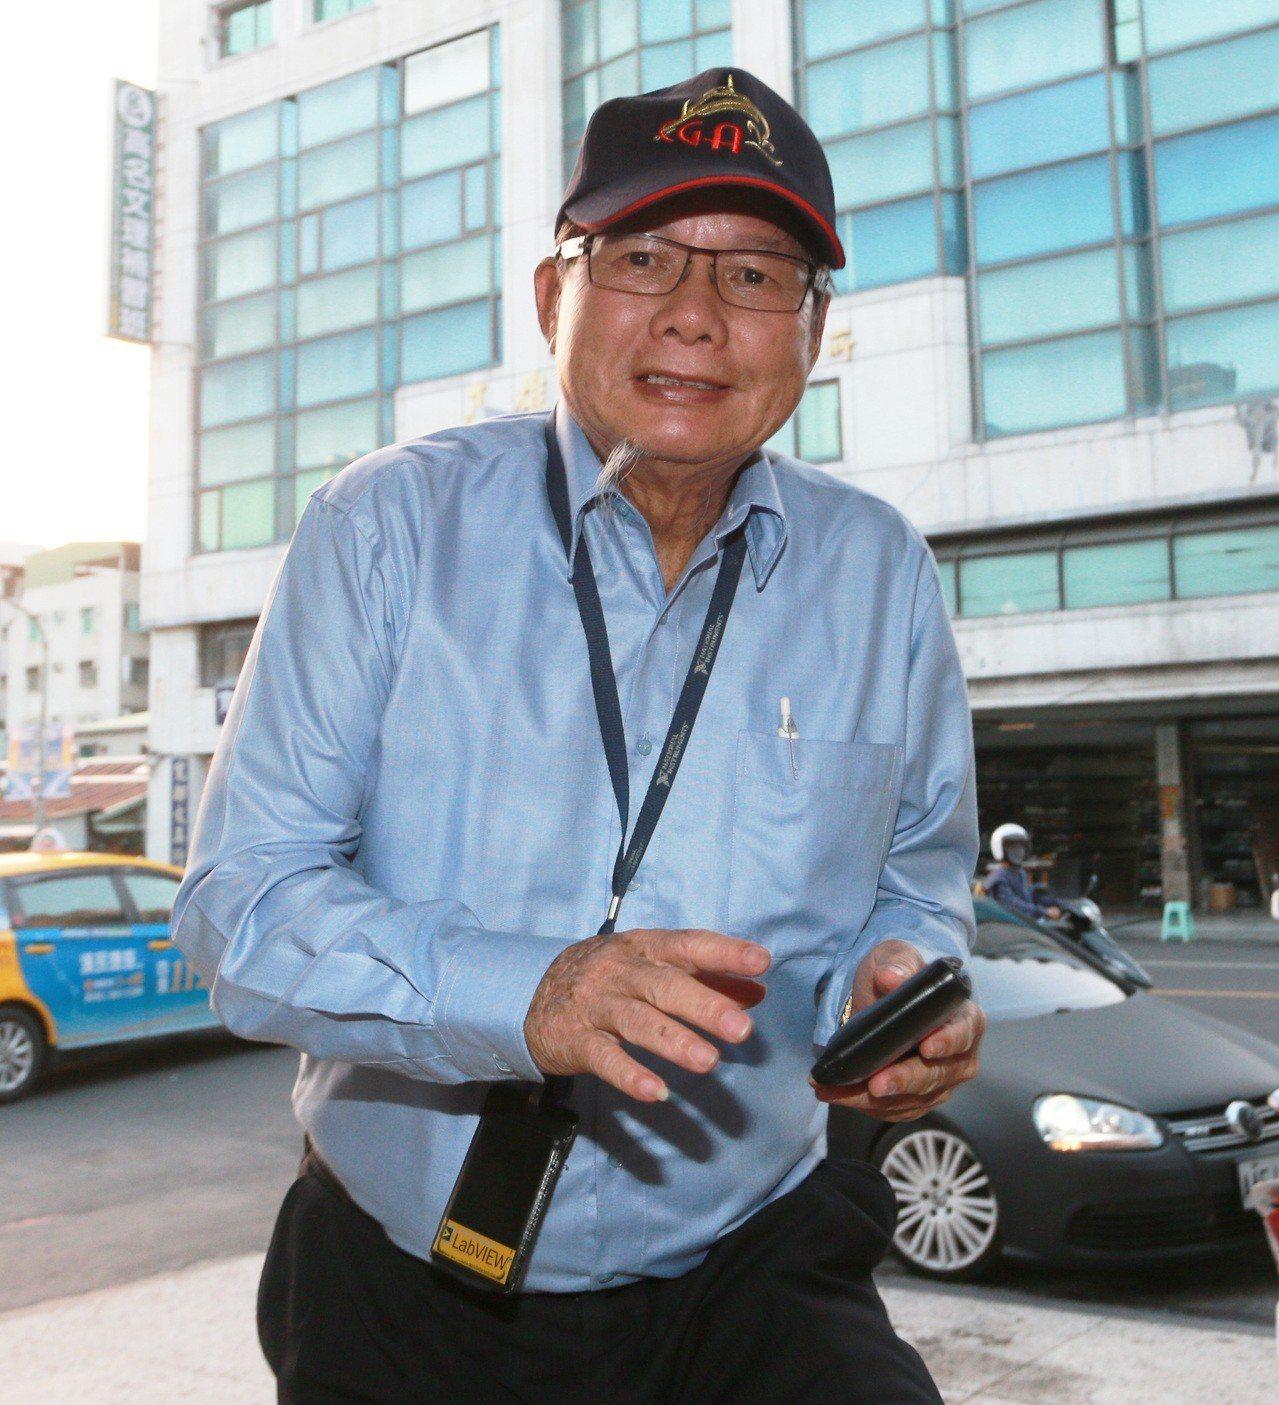 慶富董事長陳慶男被求刑30年。 圖/報系資料照片